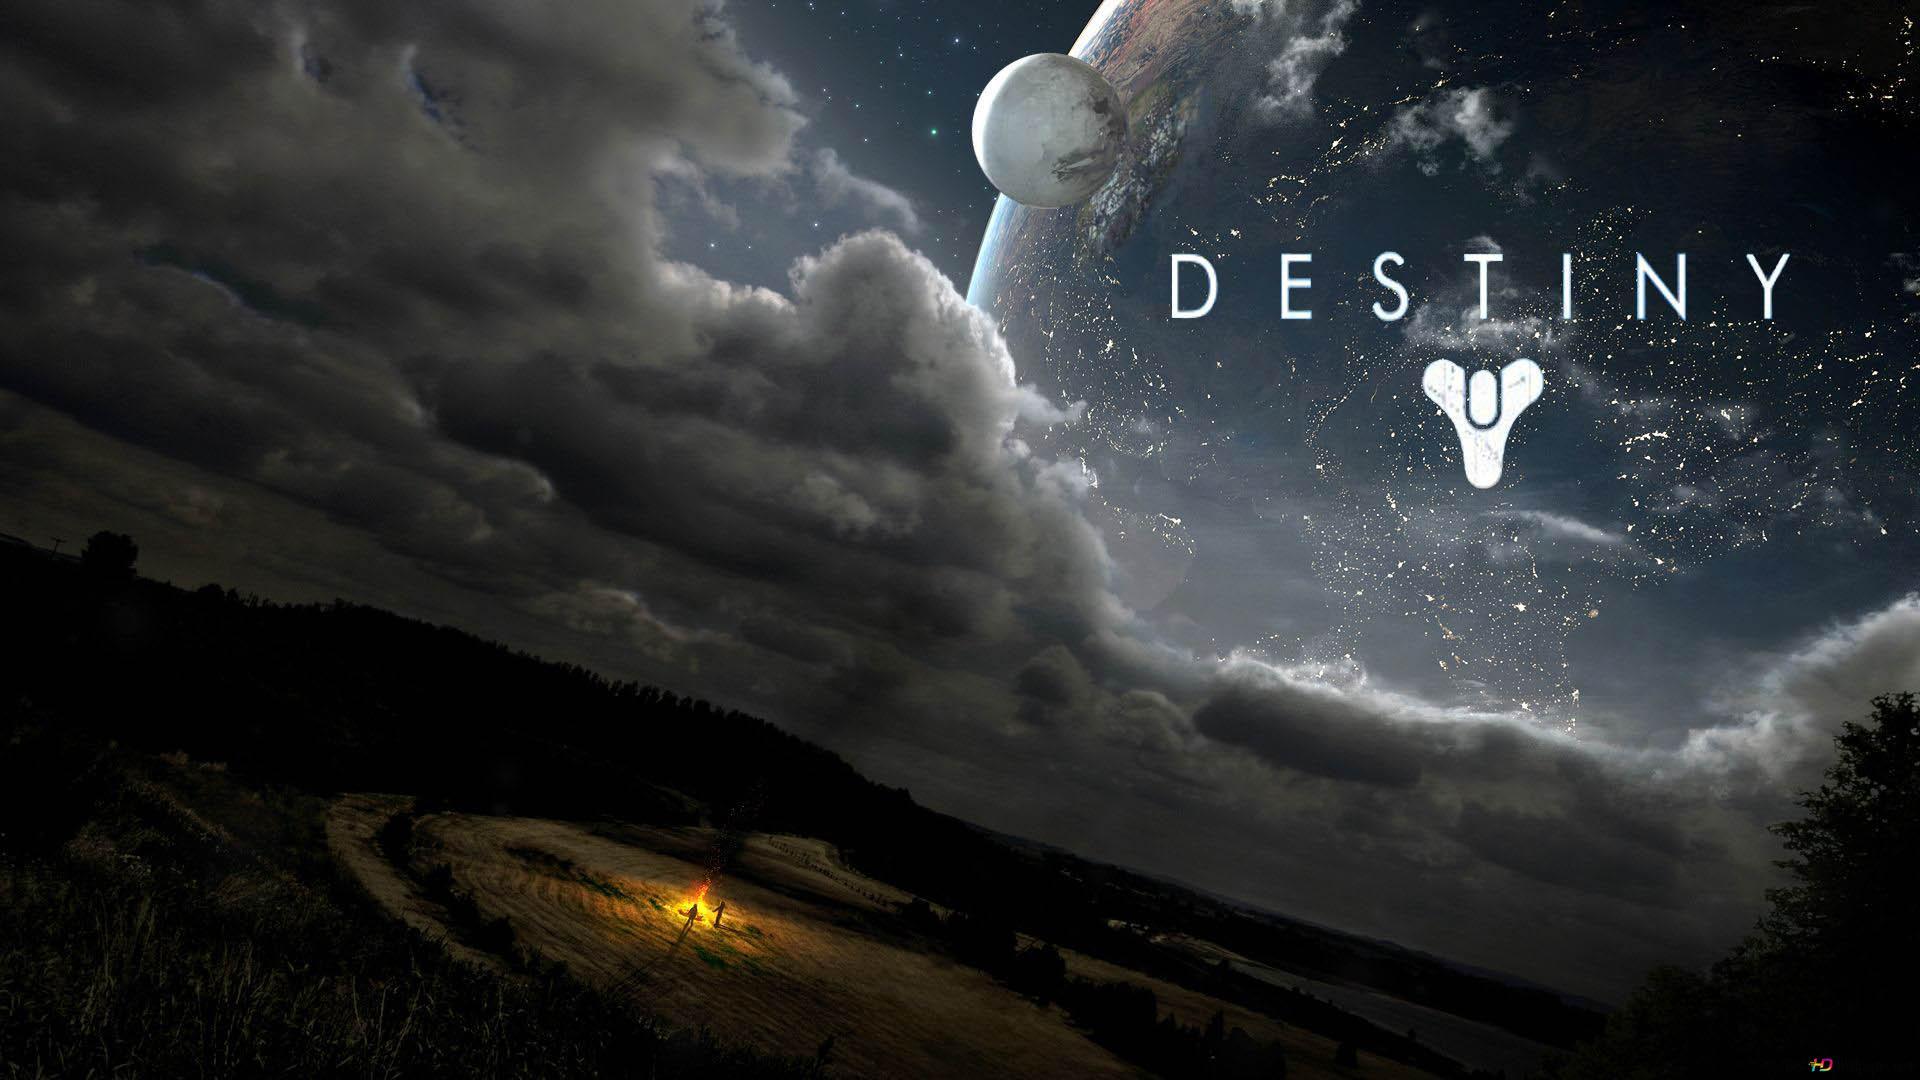 Destiny 2 Game Dream Night Hd Wallpaper Download